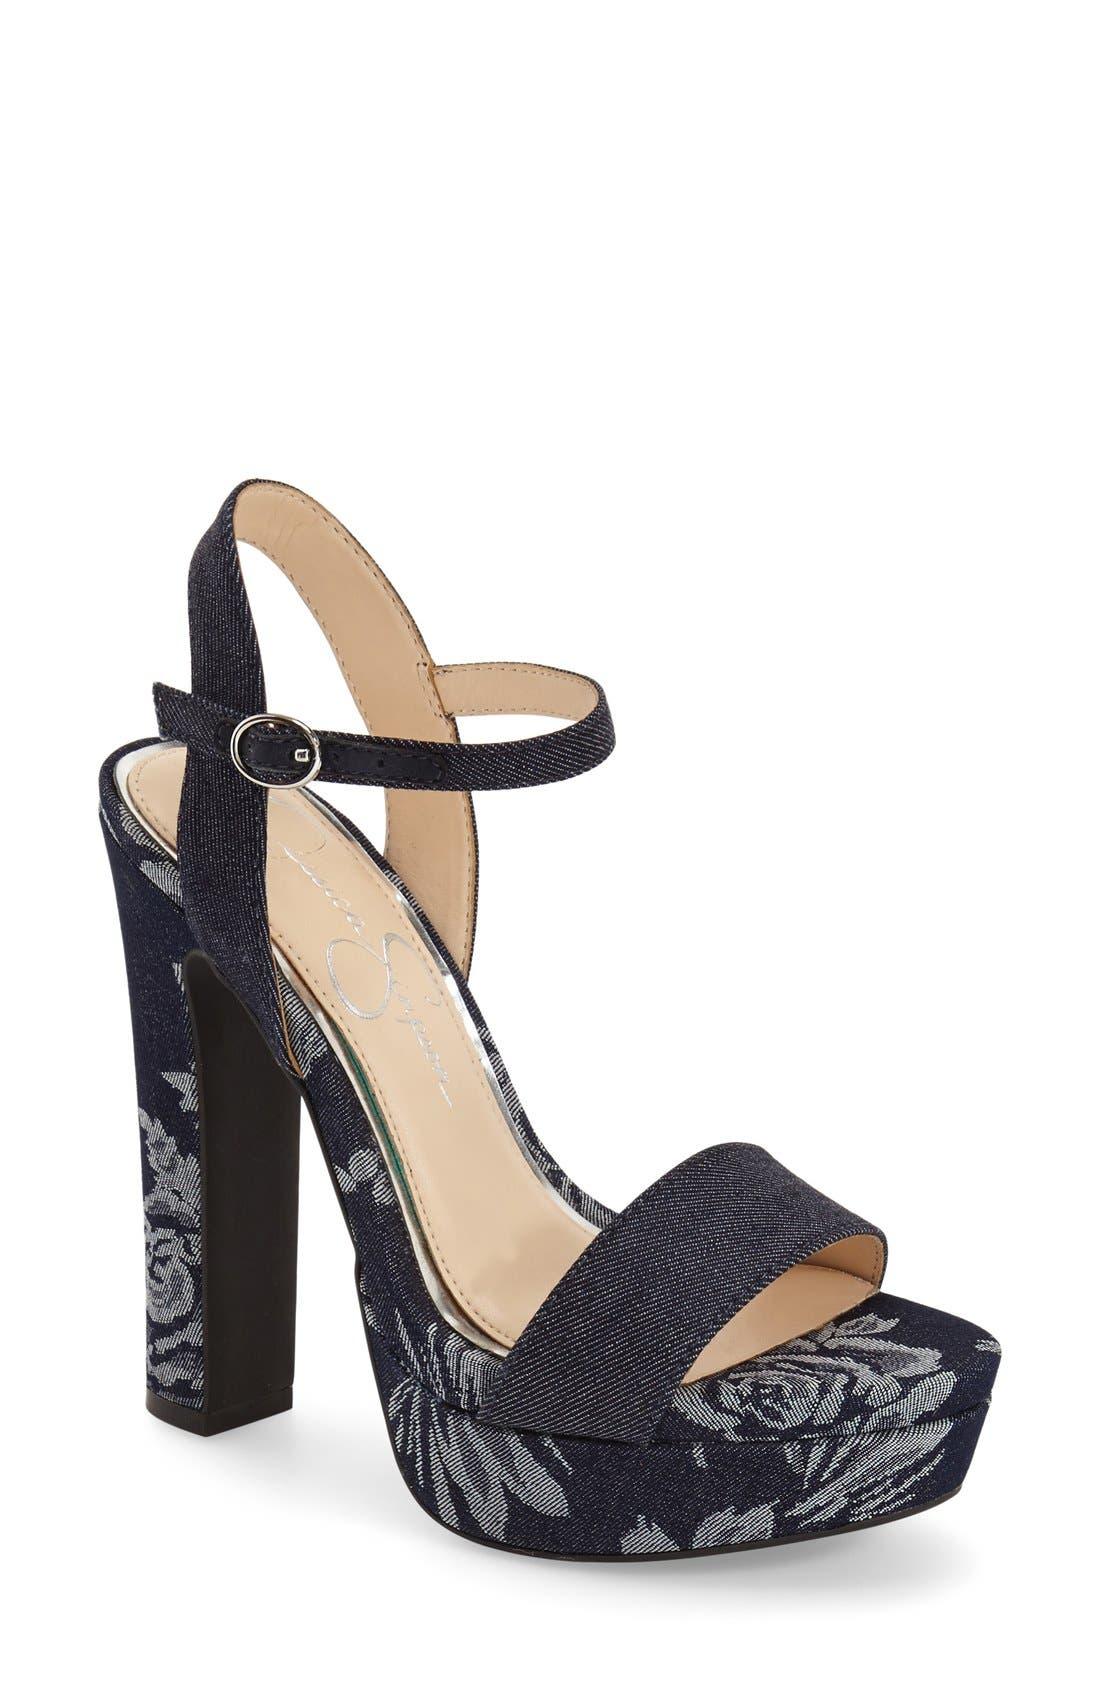 Main Image - Jessica Simpson 'Blaney' Platform Sandal (Women)